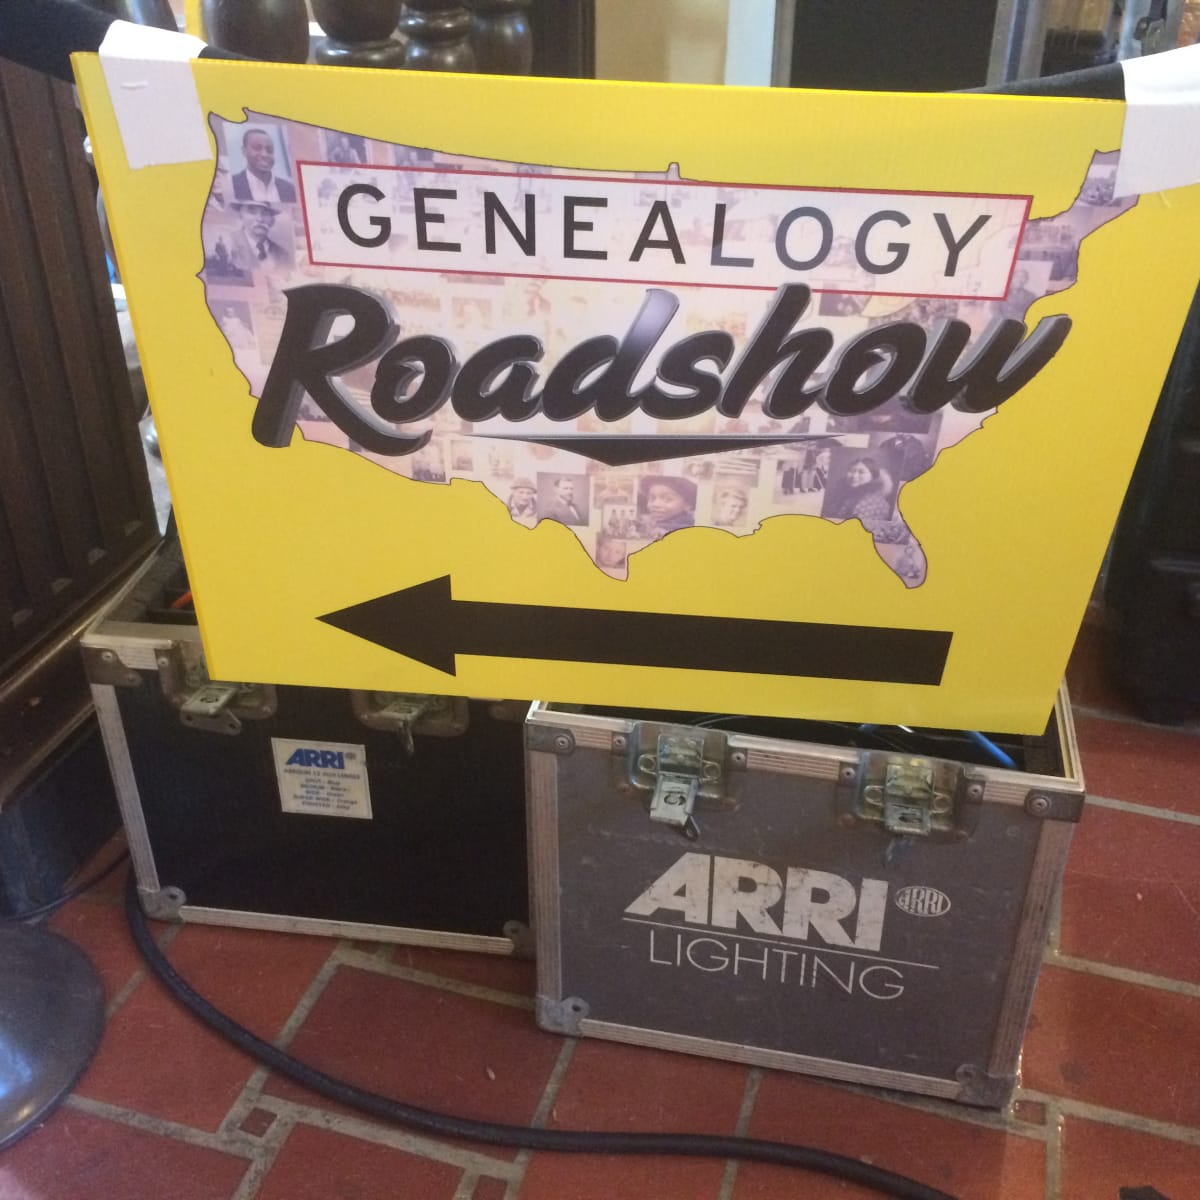 Genealogy Roadshow sign at Julia Ideson Building